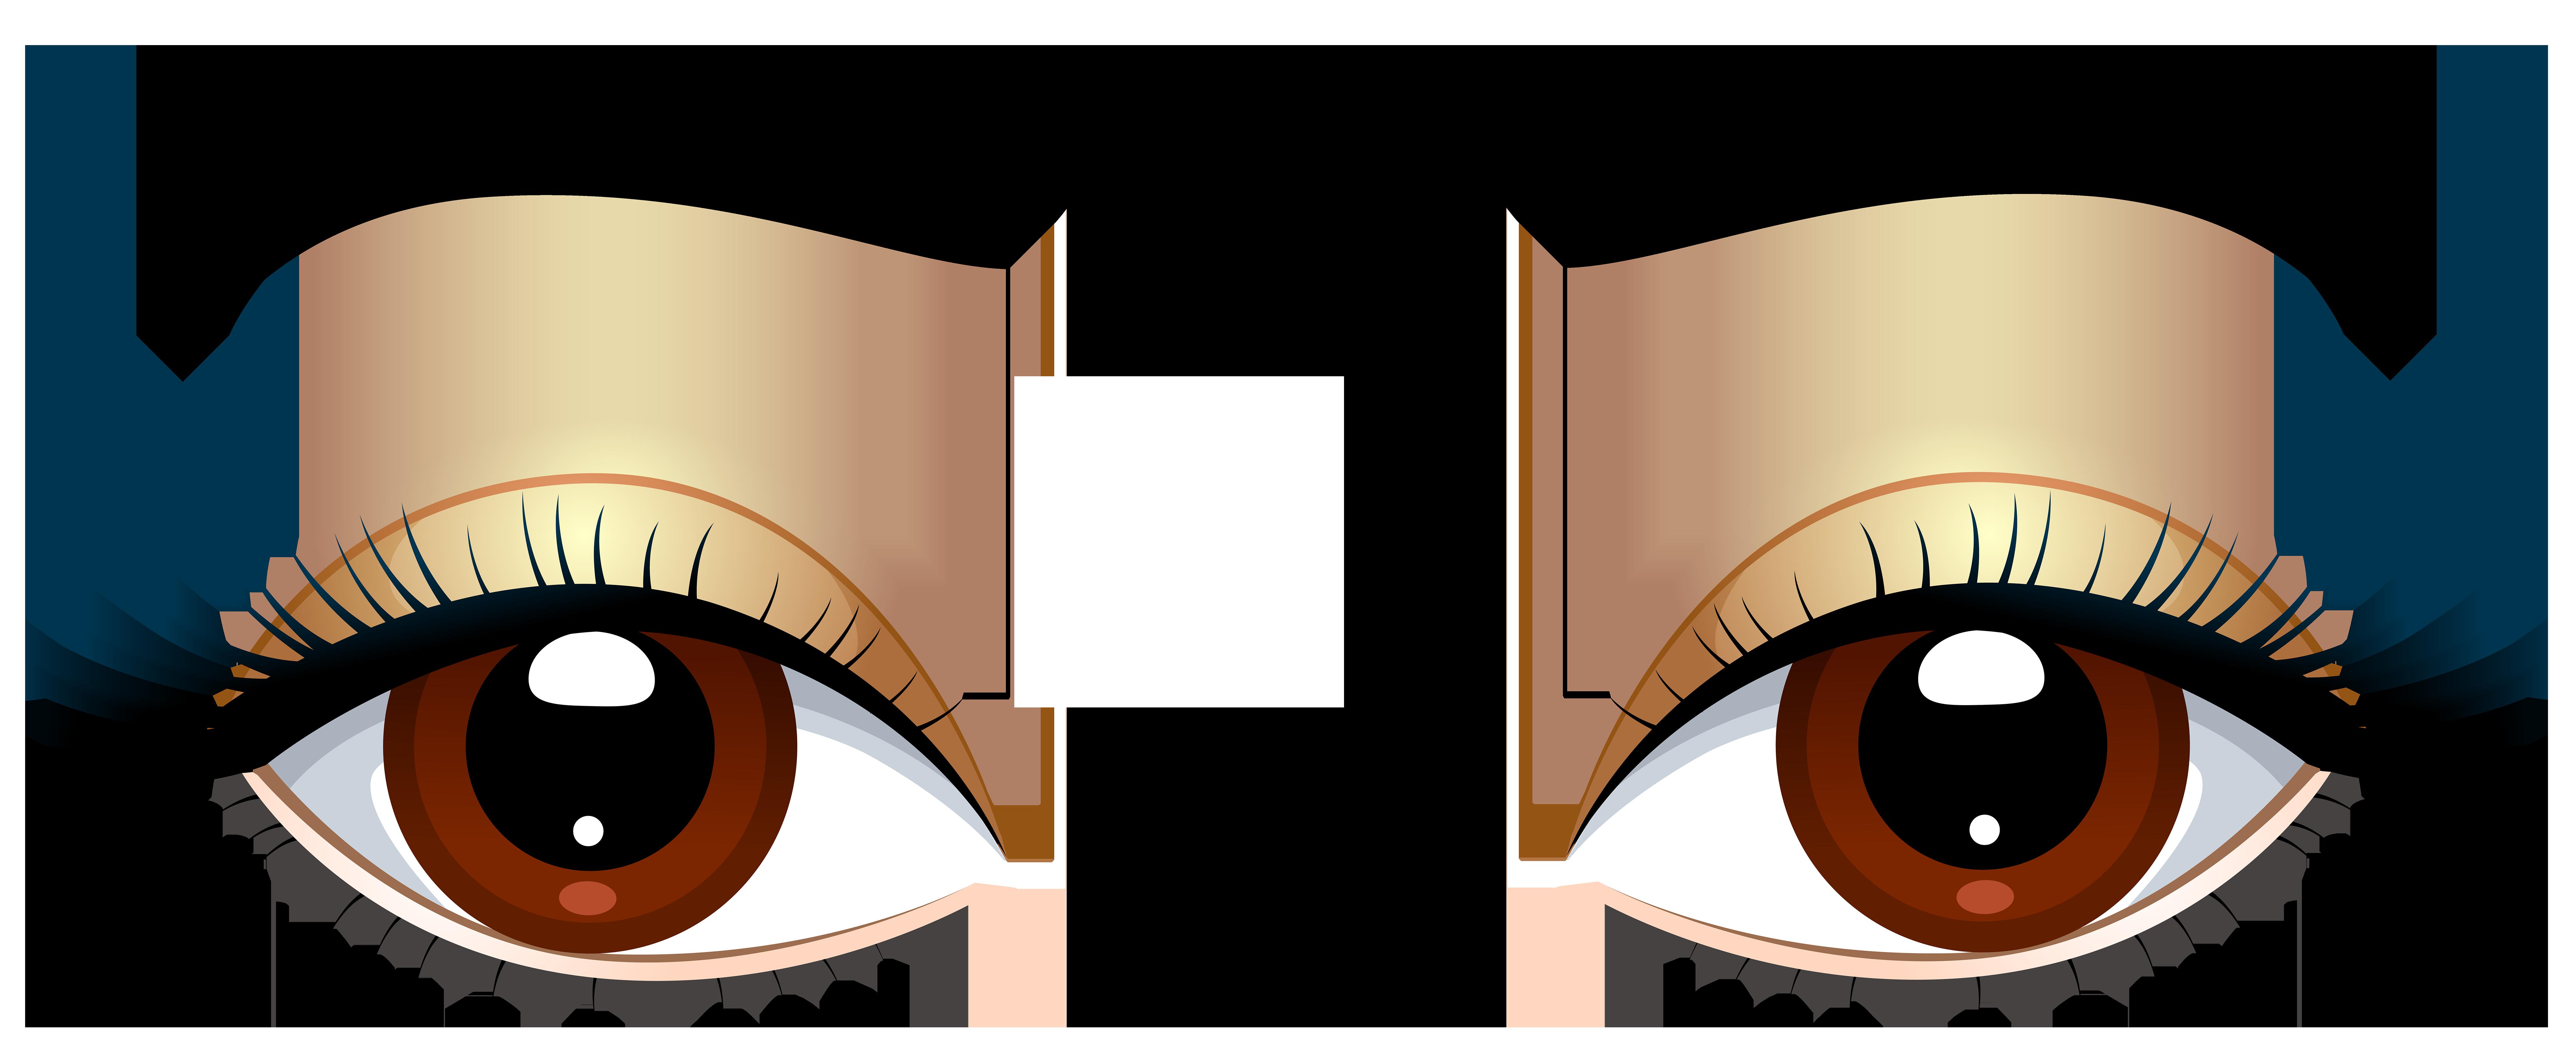 8000x3219 Pleasant Eyes Clipart Big Cartoon Free Download On Png Clipartix